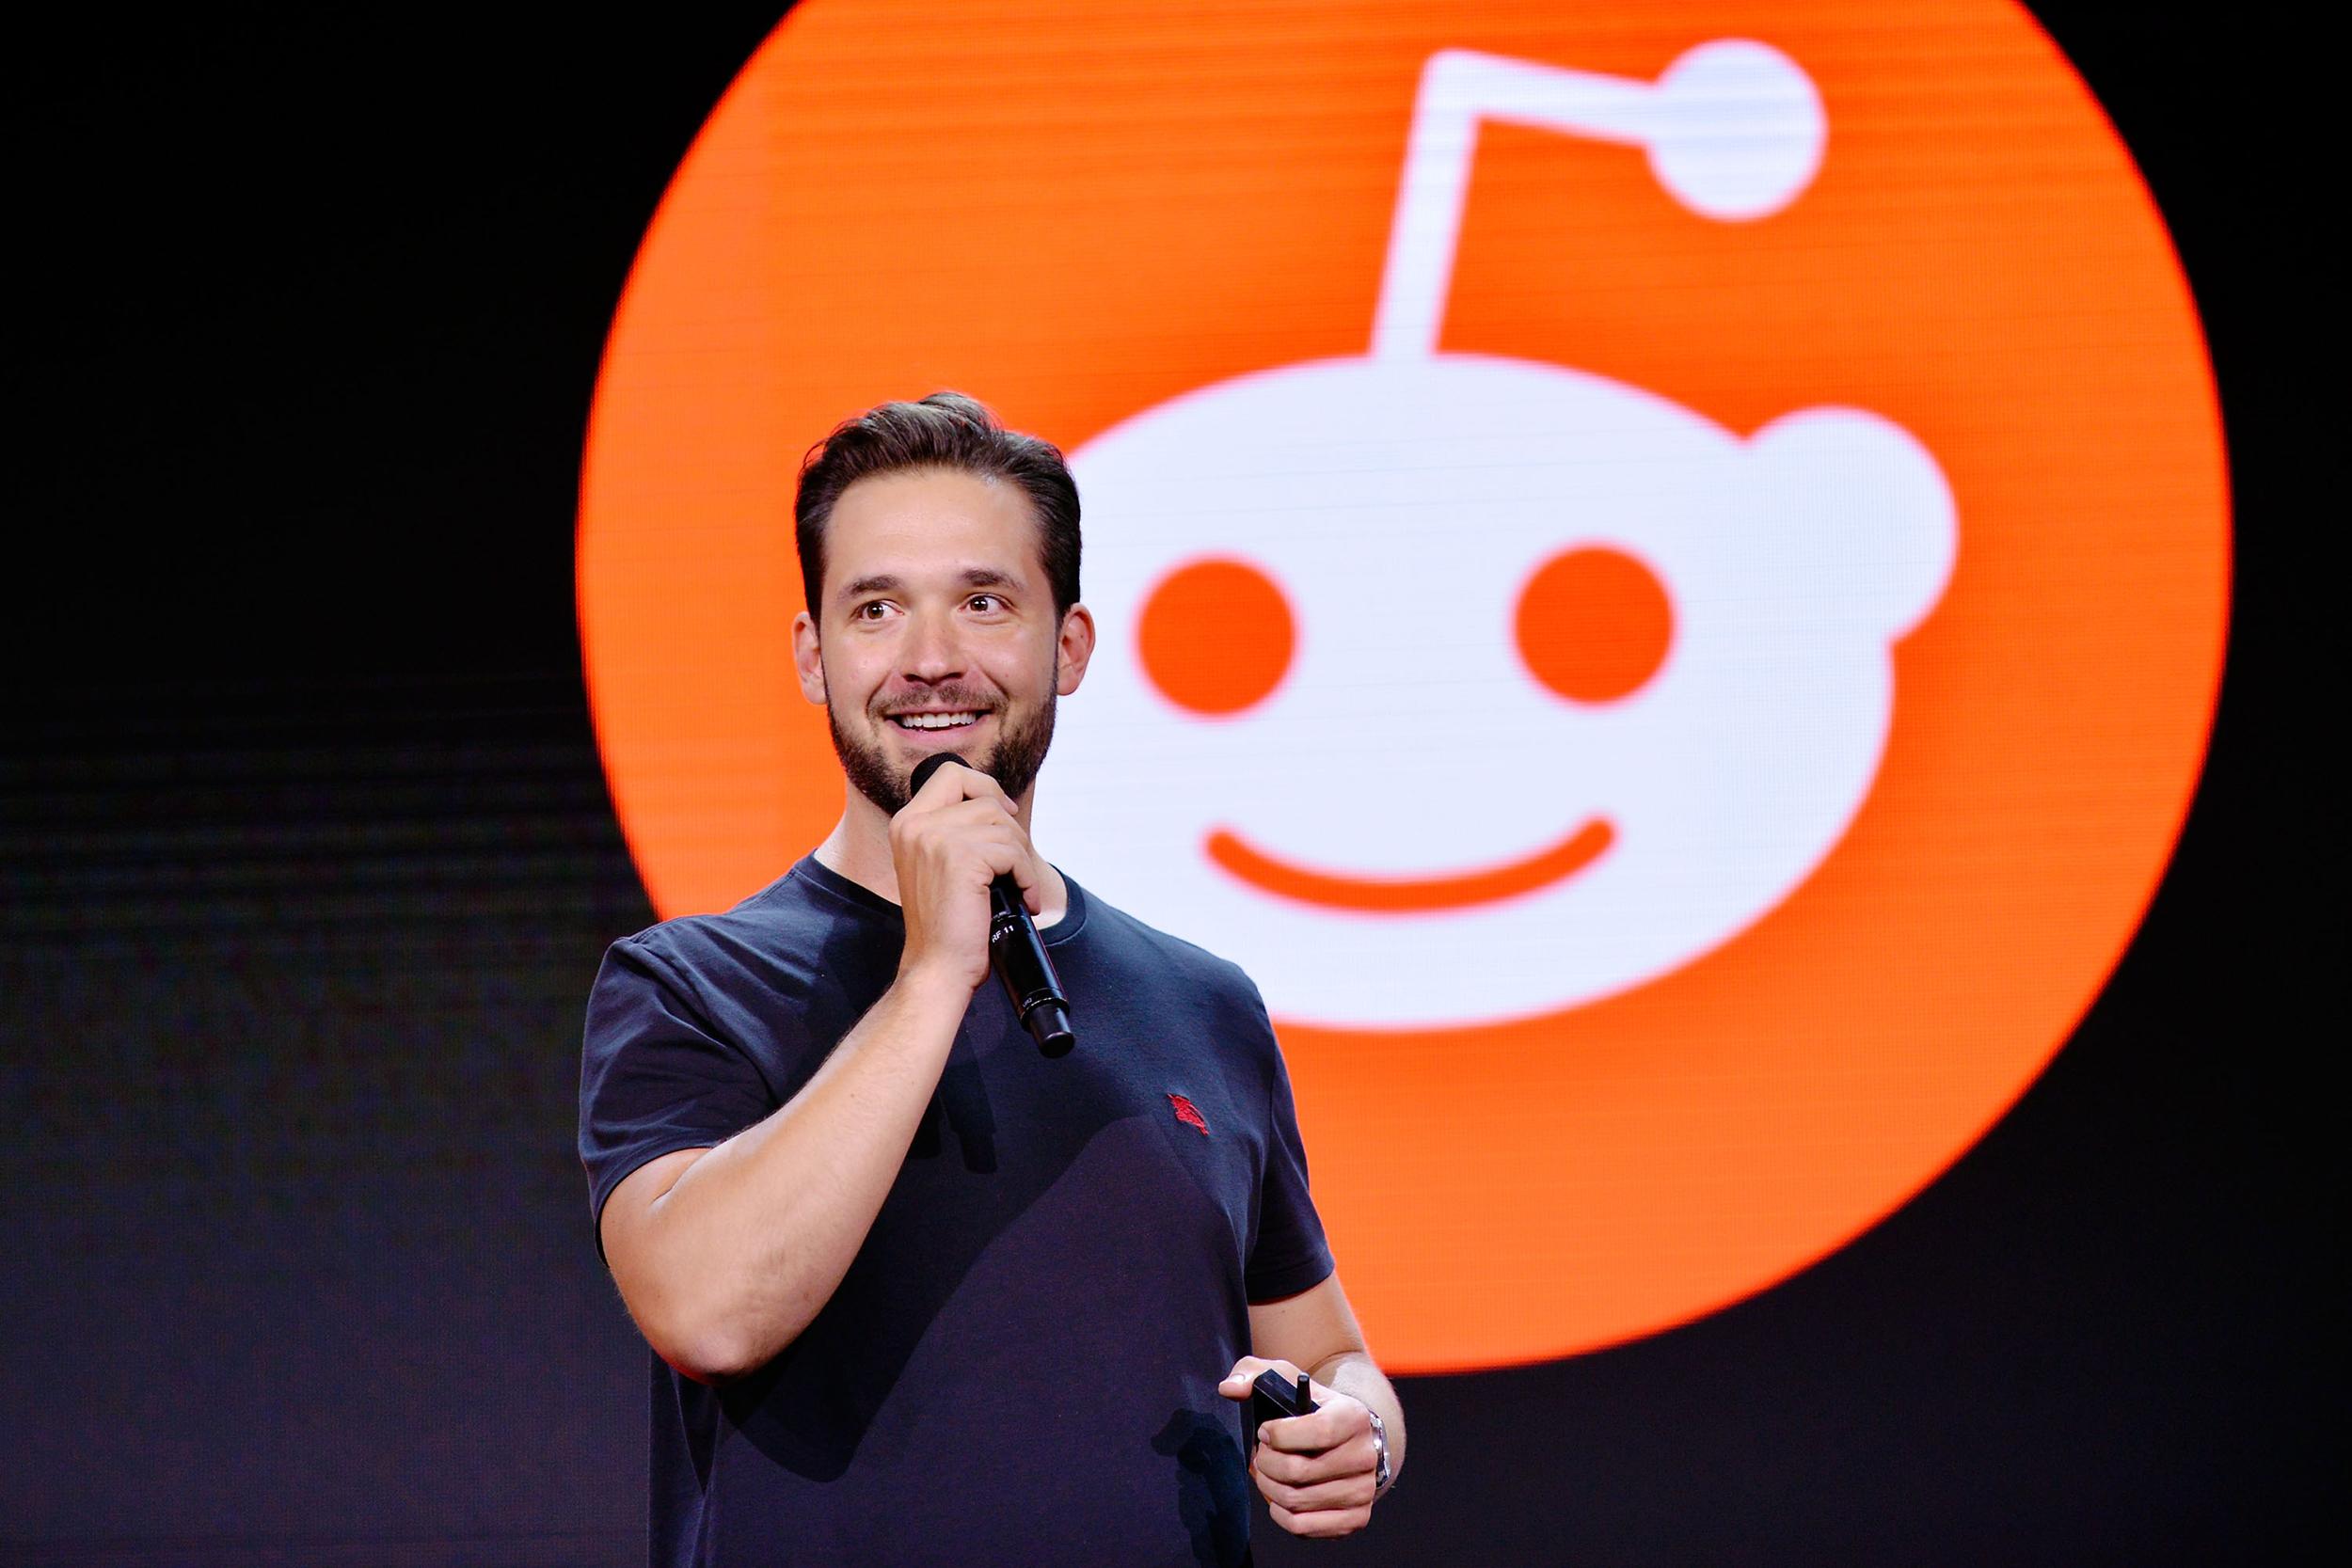 Reddit co-founder Alexis Ohanian on parental leave